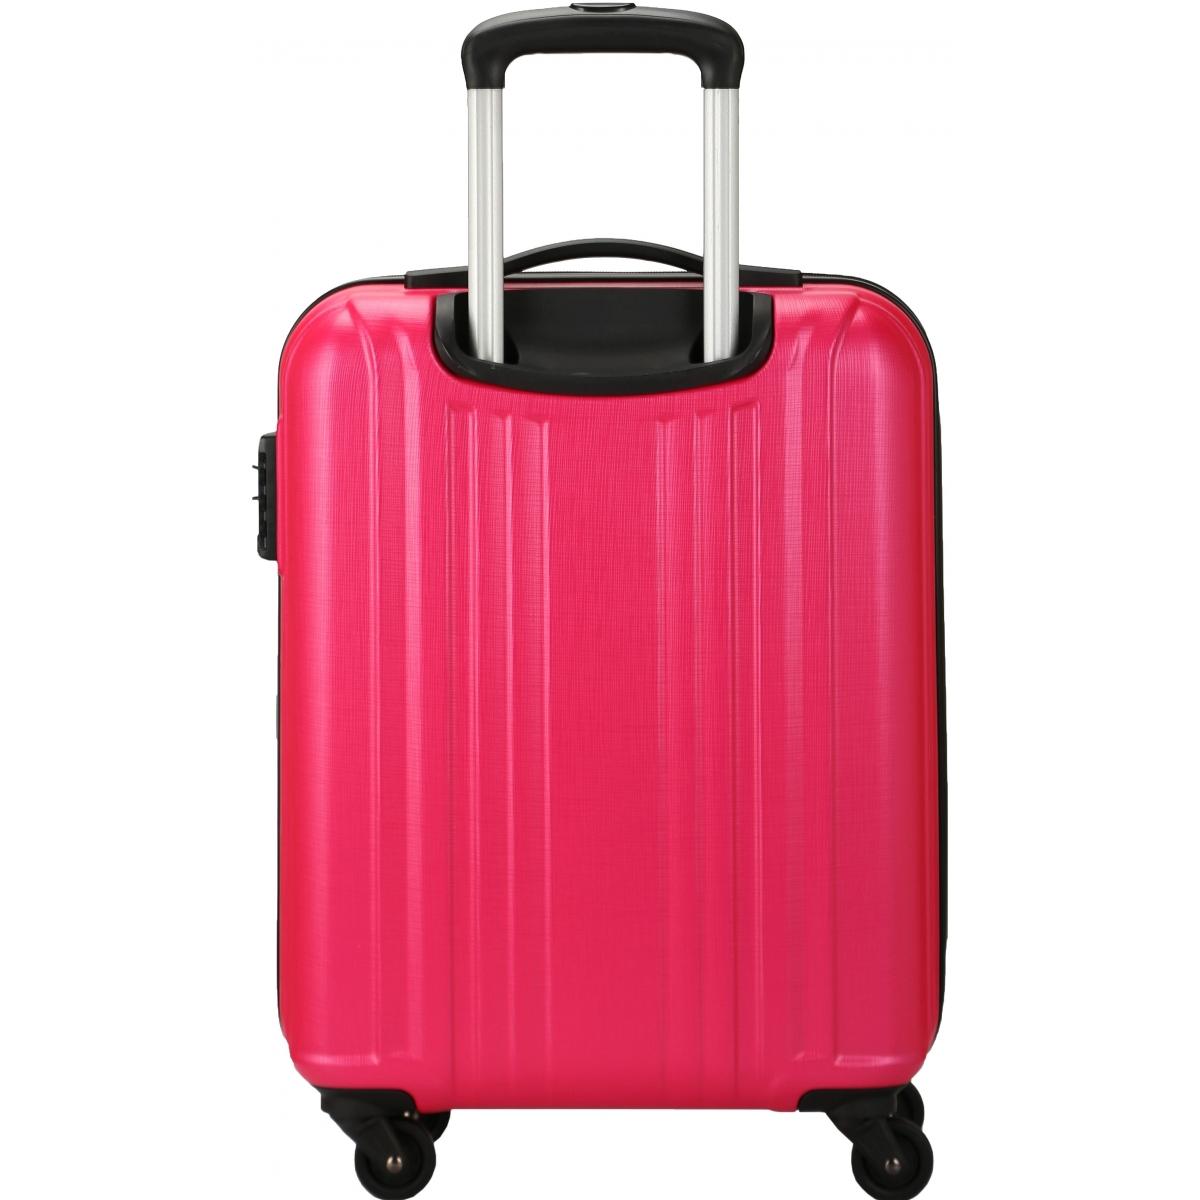 valise cabine rigide david jones 55cm ba10171p couleur. Black Bedroom Furniture Sets. Home Design Ideas